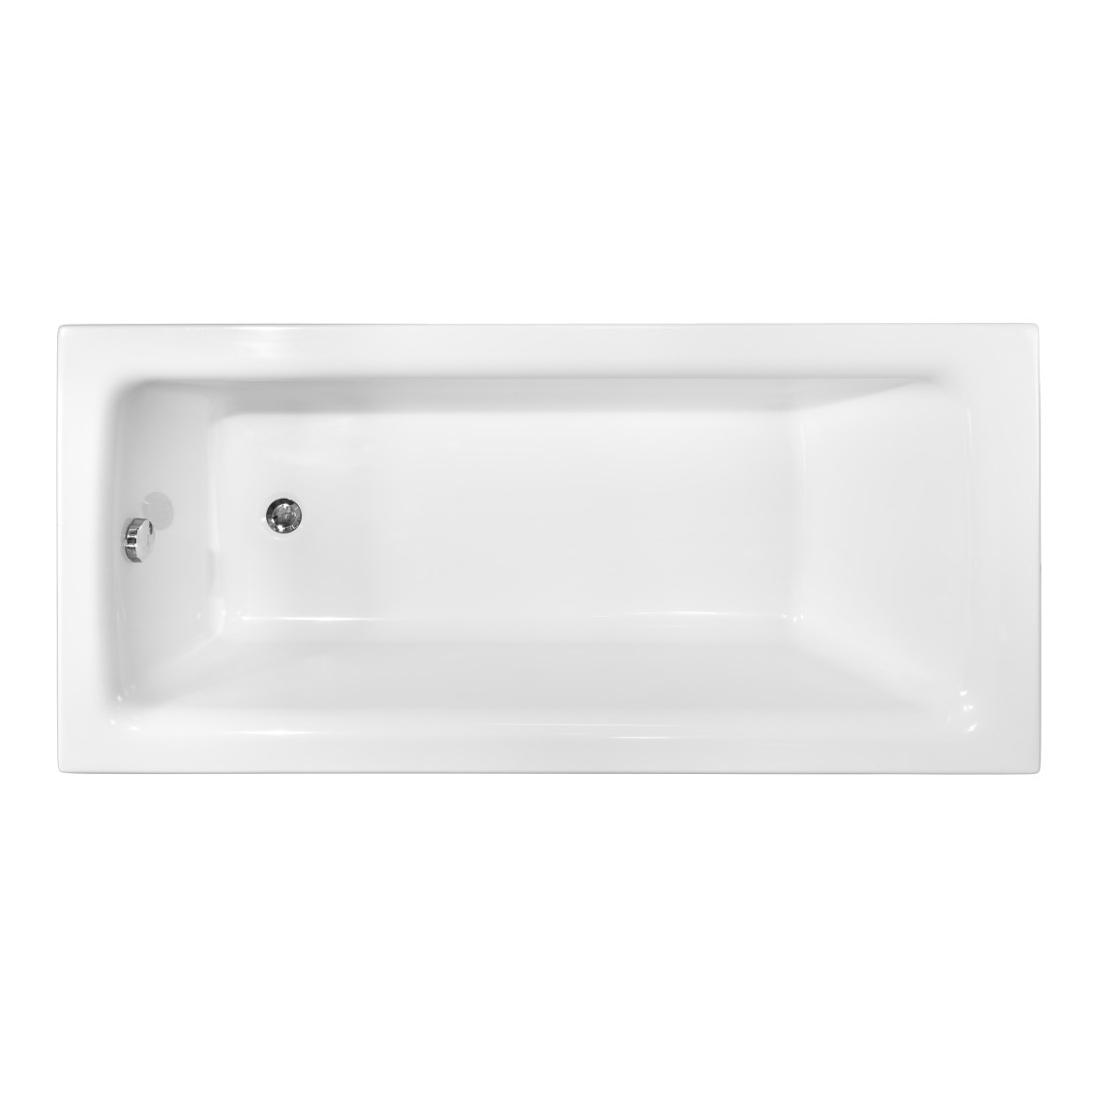 Акриловая ванна Besco Talia 150x70 цены онлайн